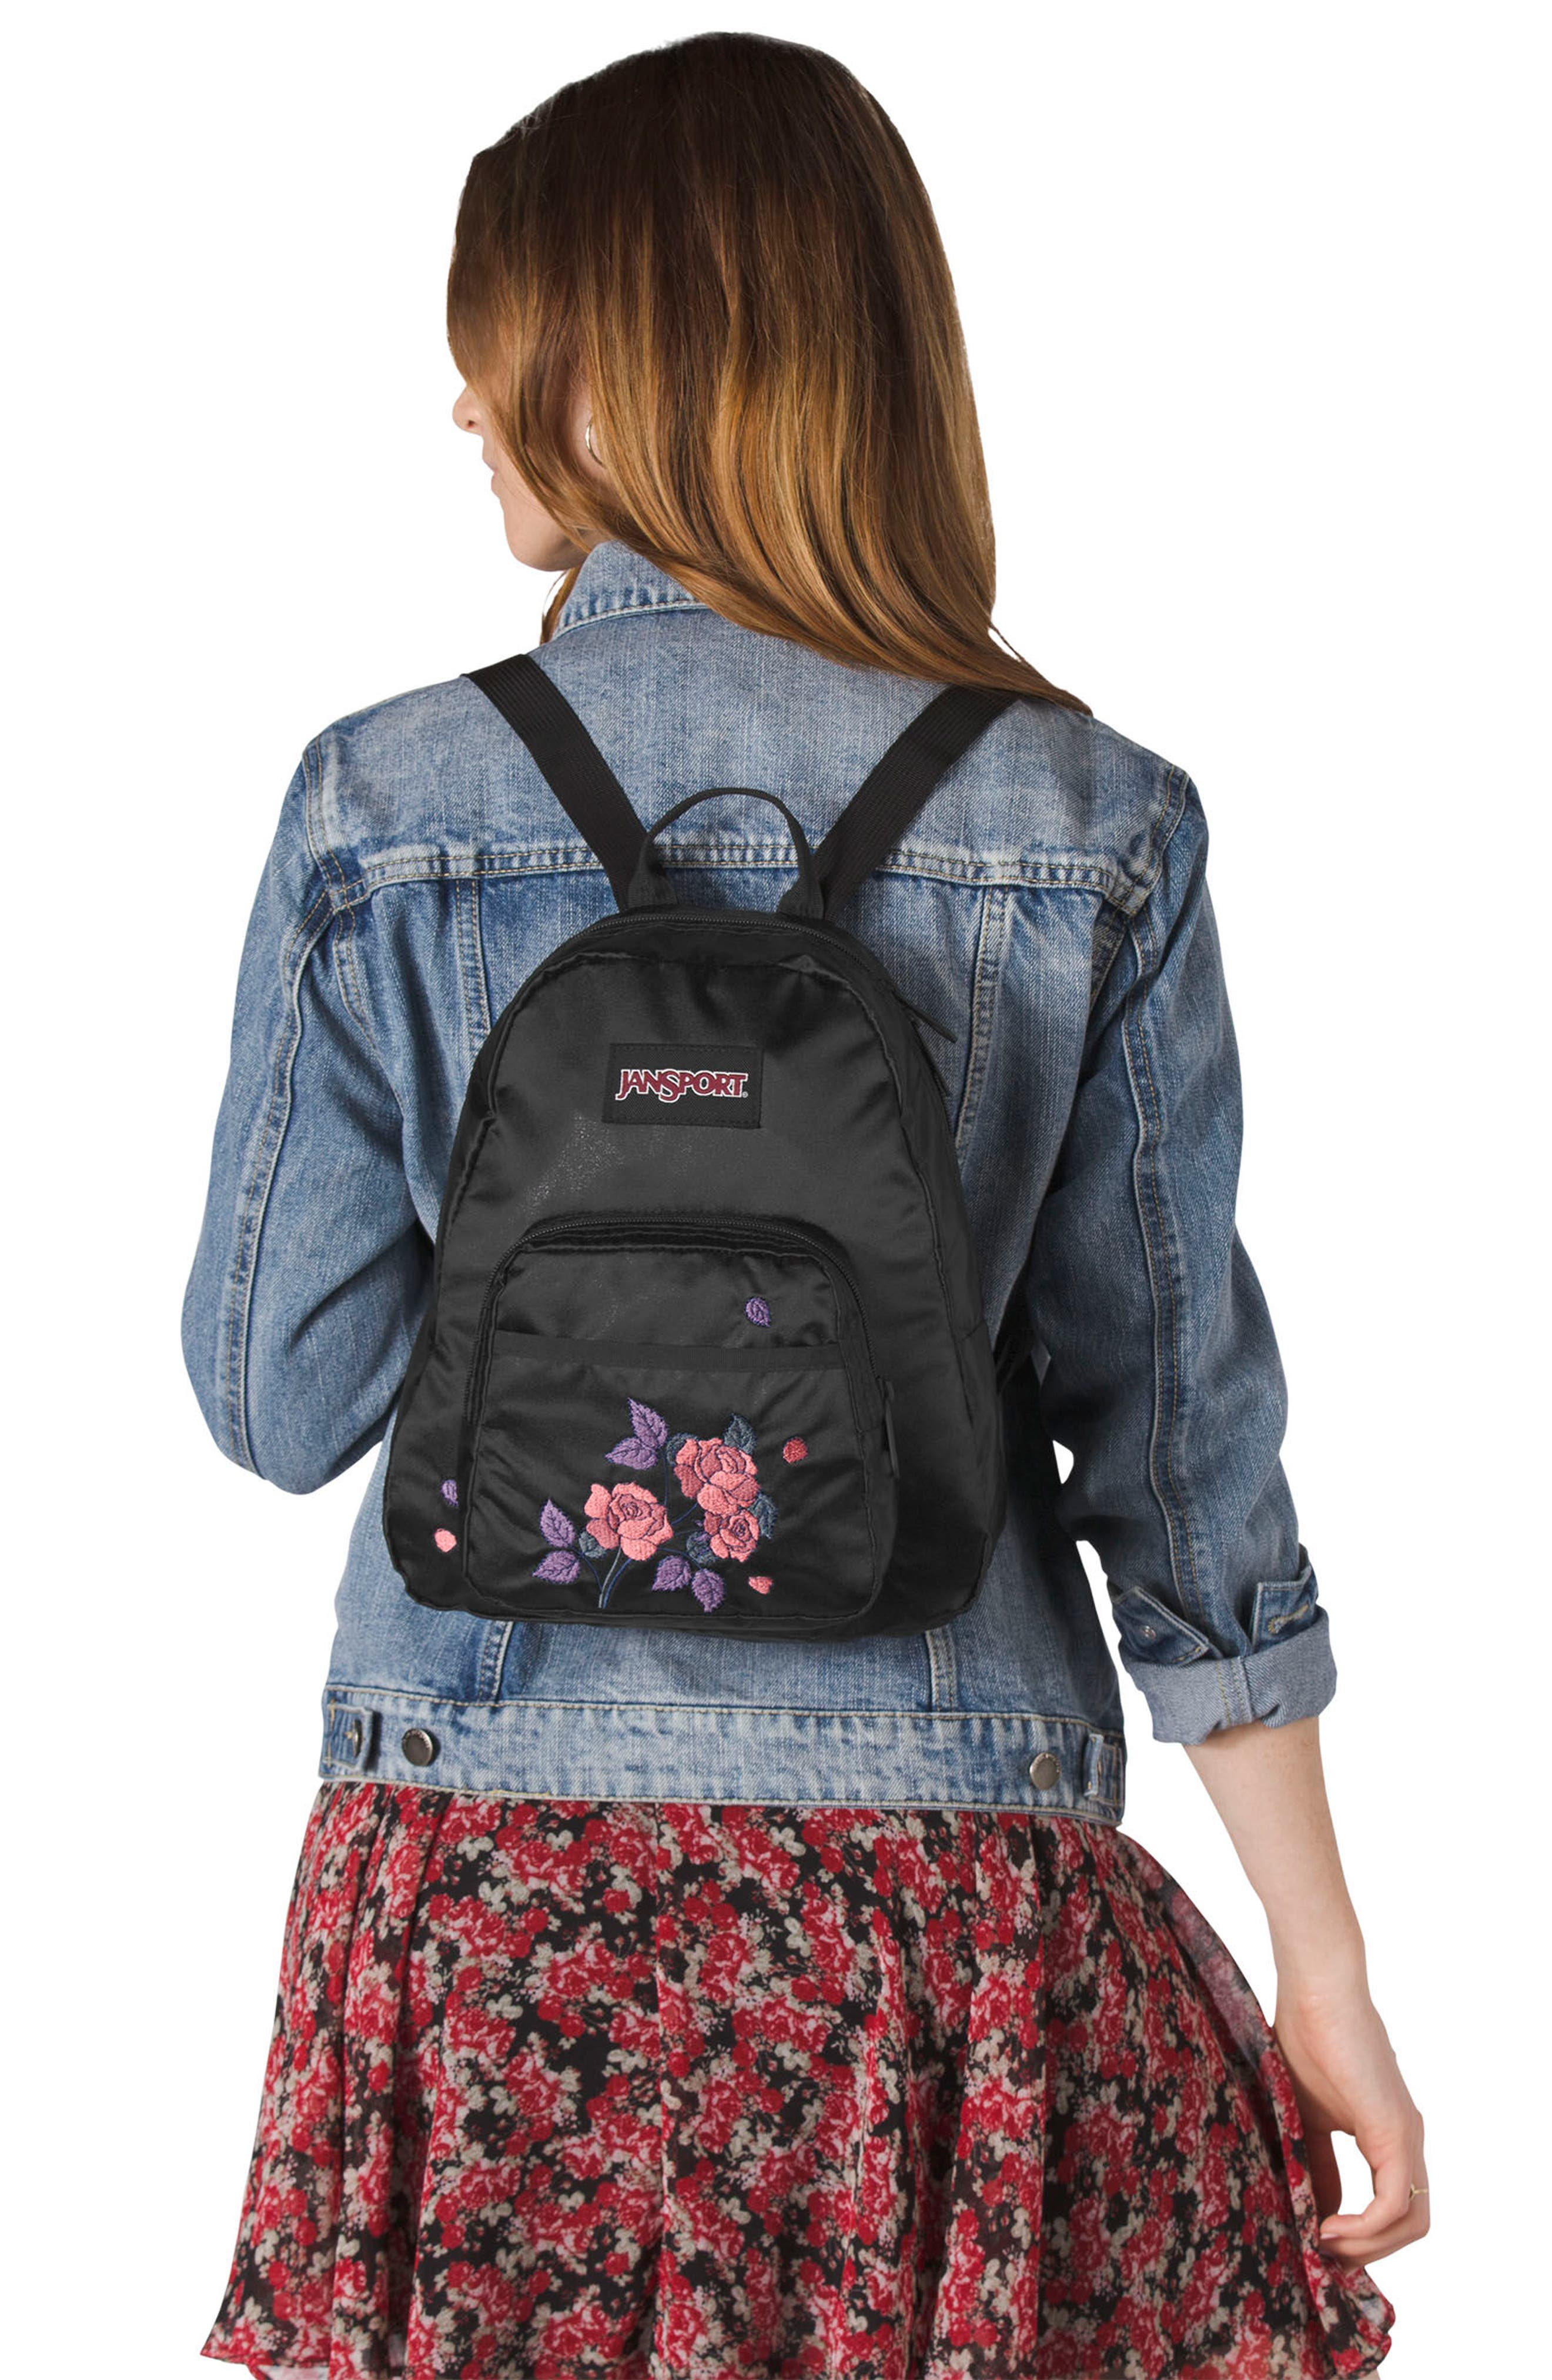 Half Pint FX Backpack,                             Alternate thumbnail 4, color,                             SATIN ROSE